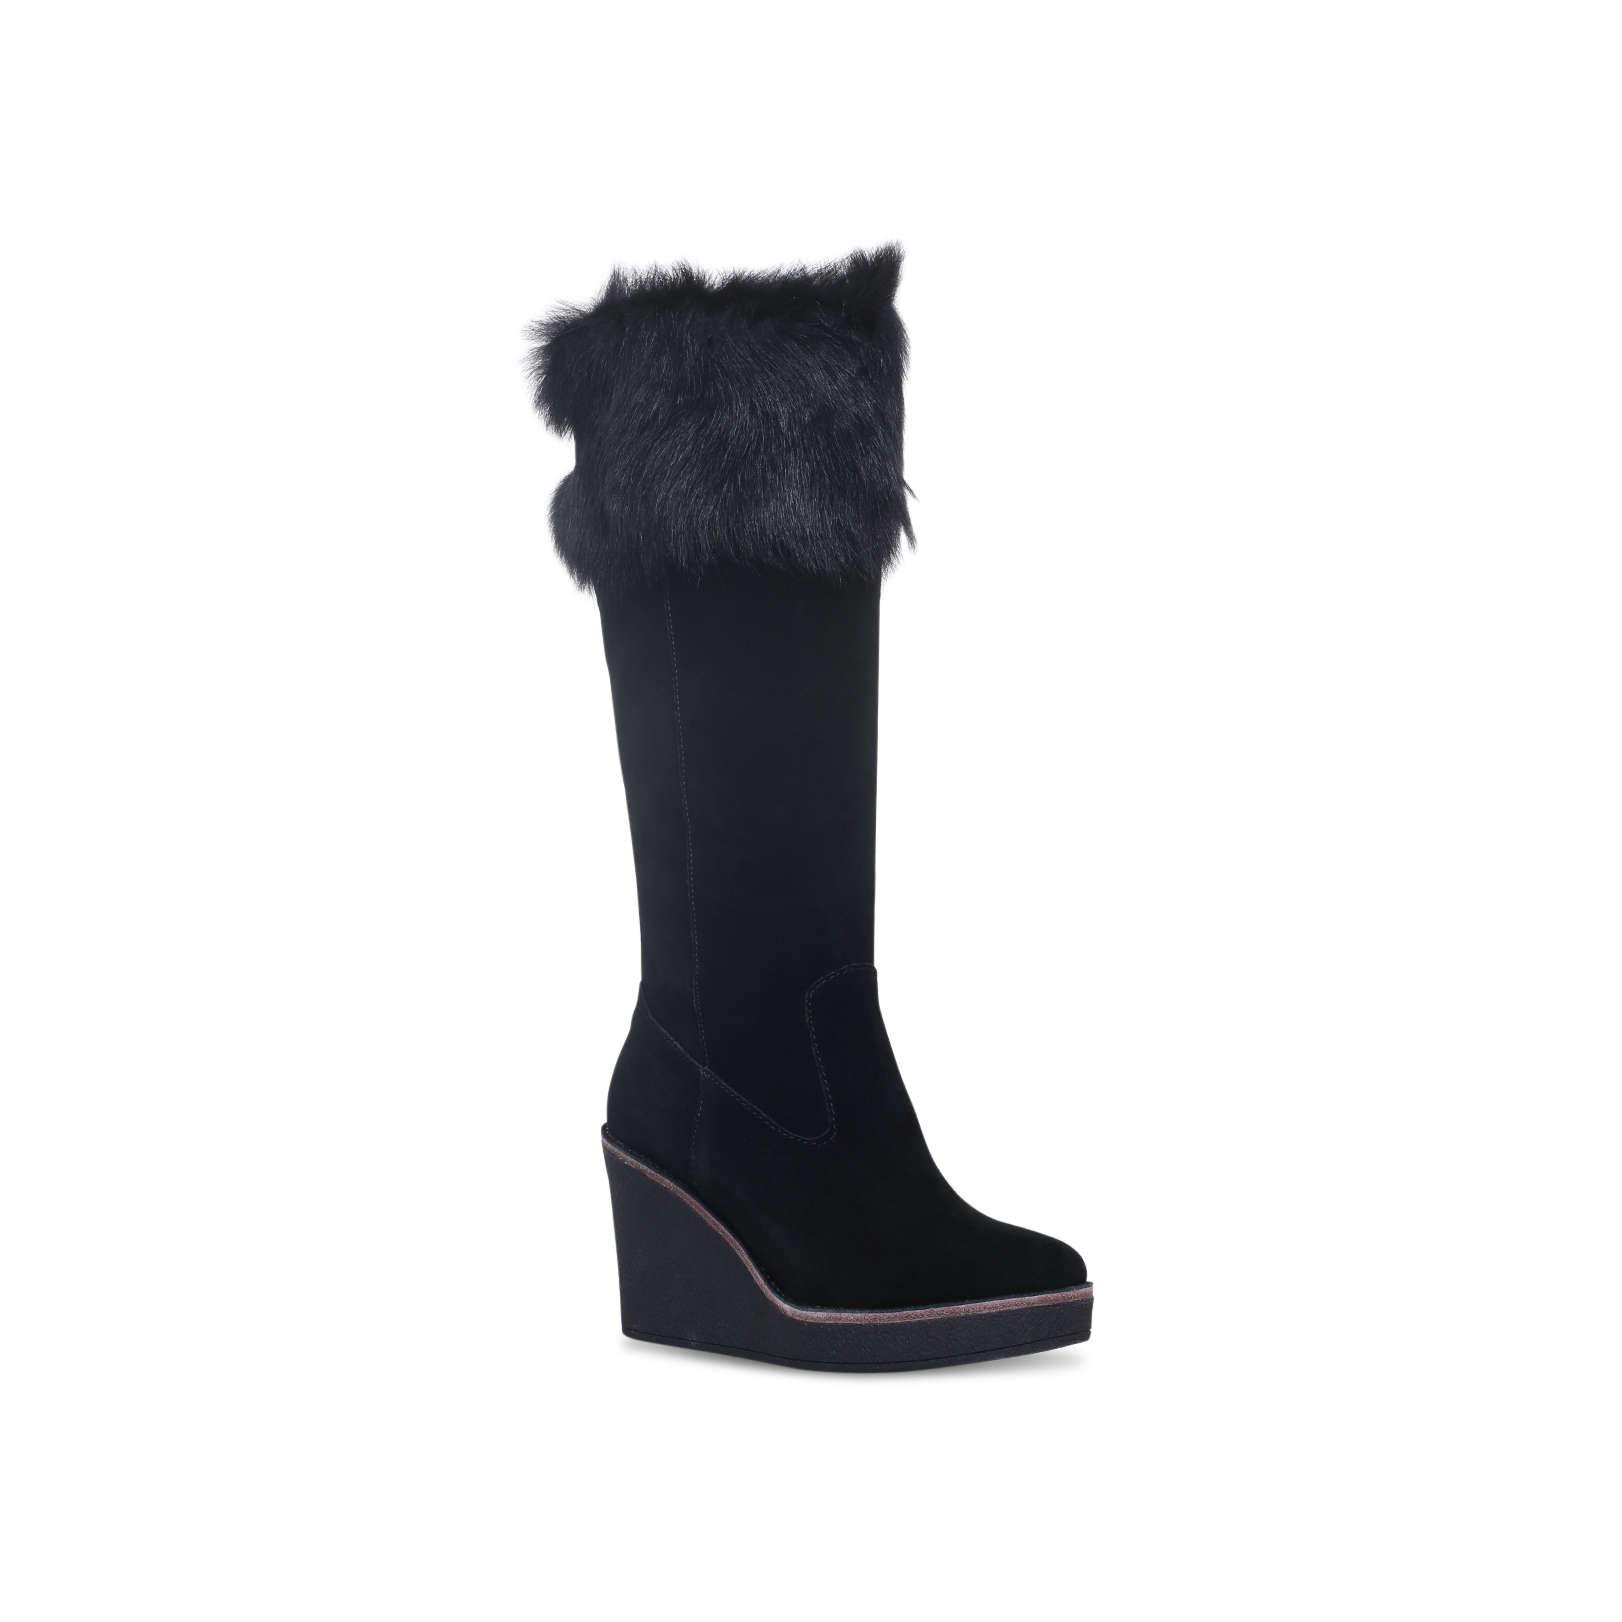 2597e39755ba VALBERG Ugg Australia Valberg Black Suede High Leg Boots by UGG